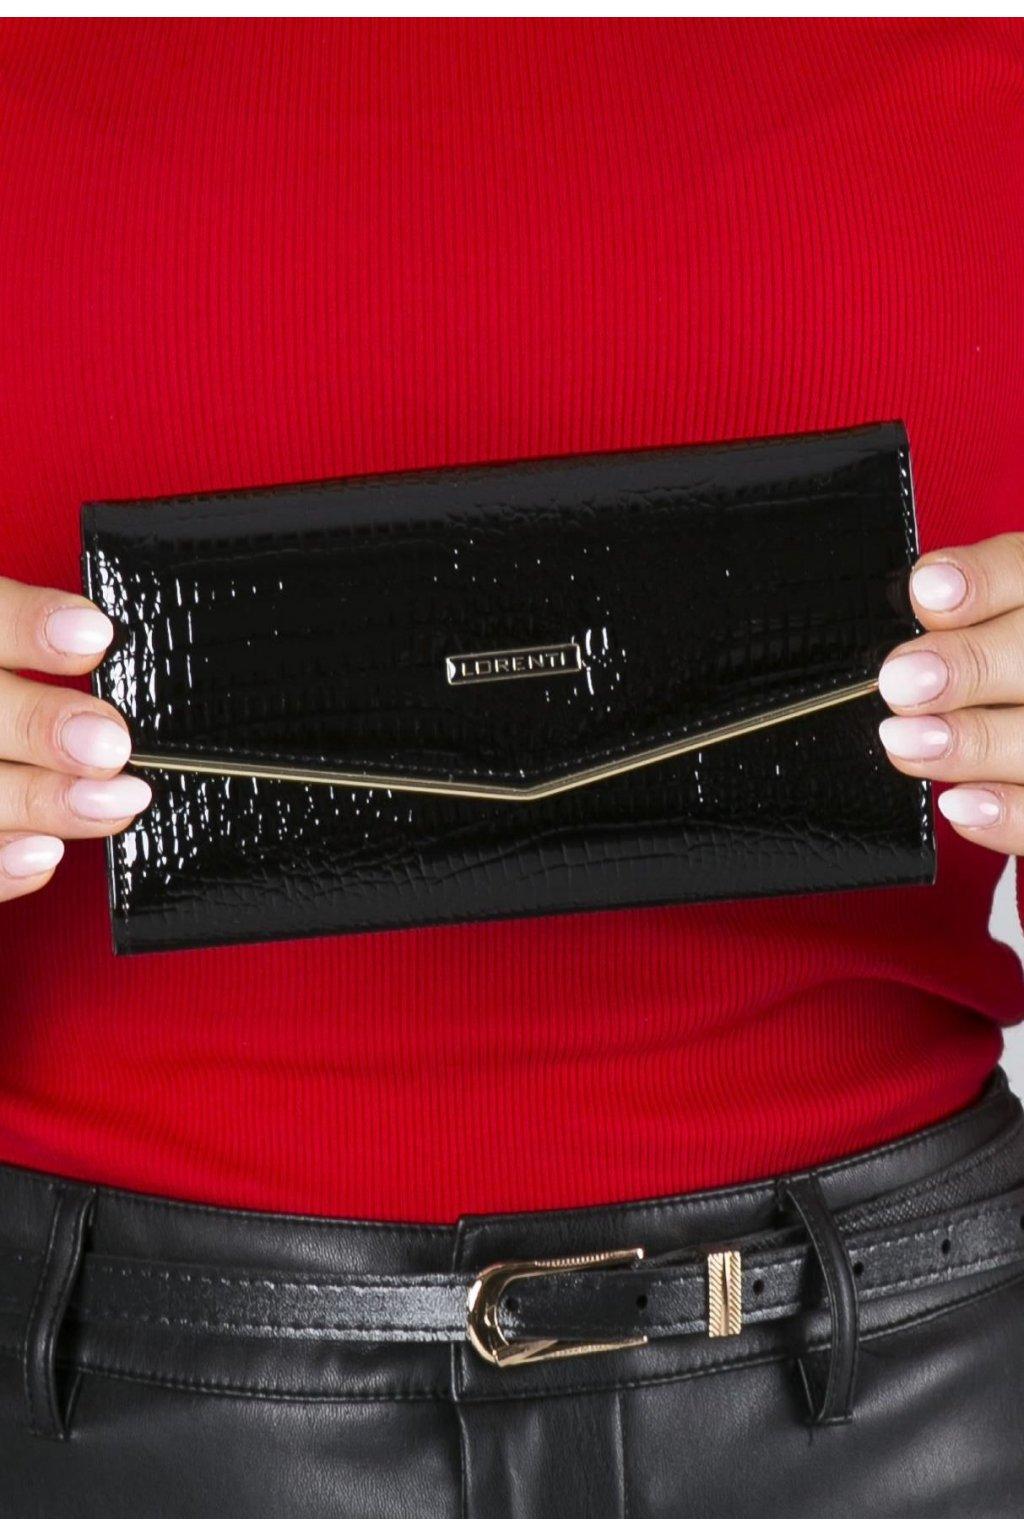 Čierna dámska peňaženka